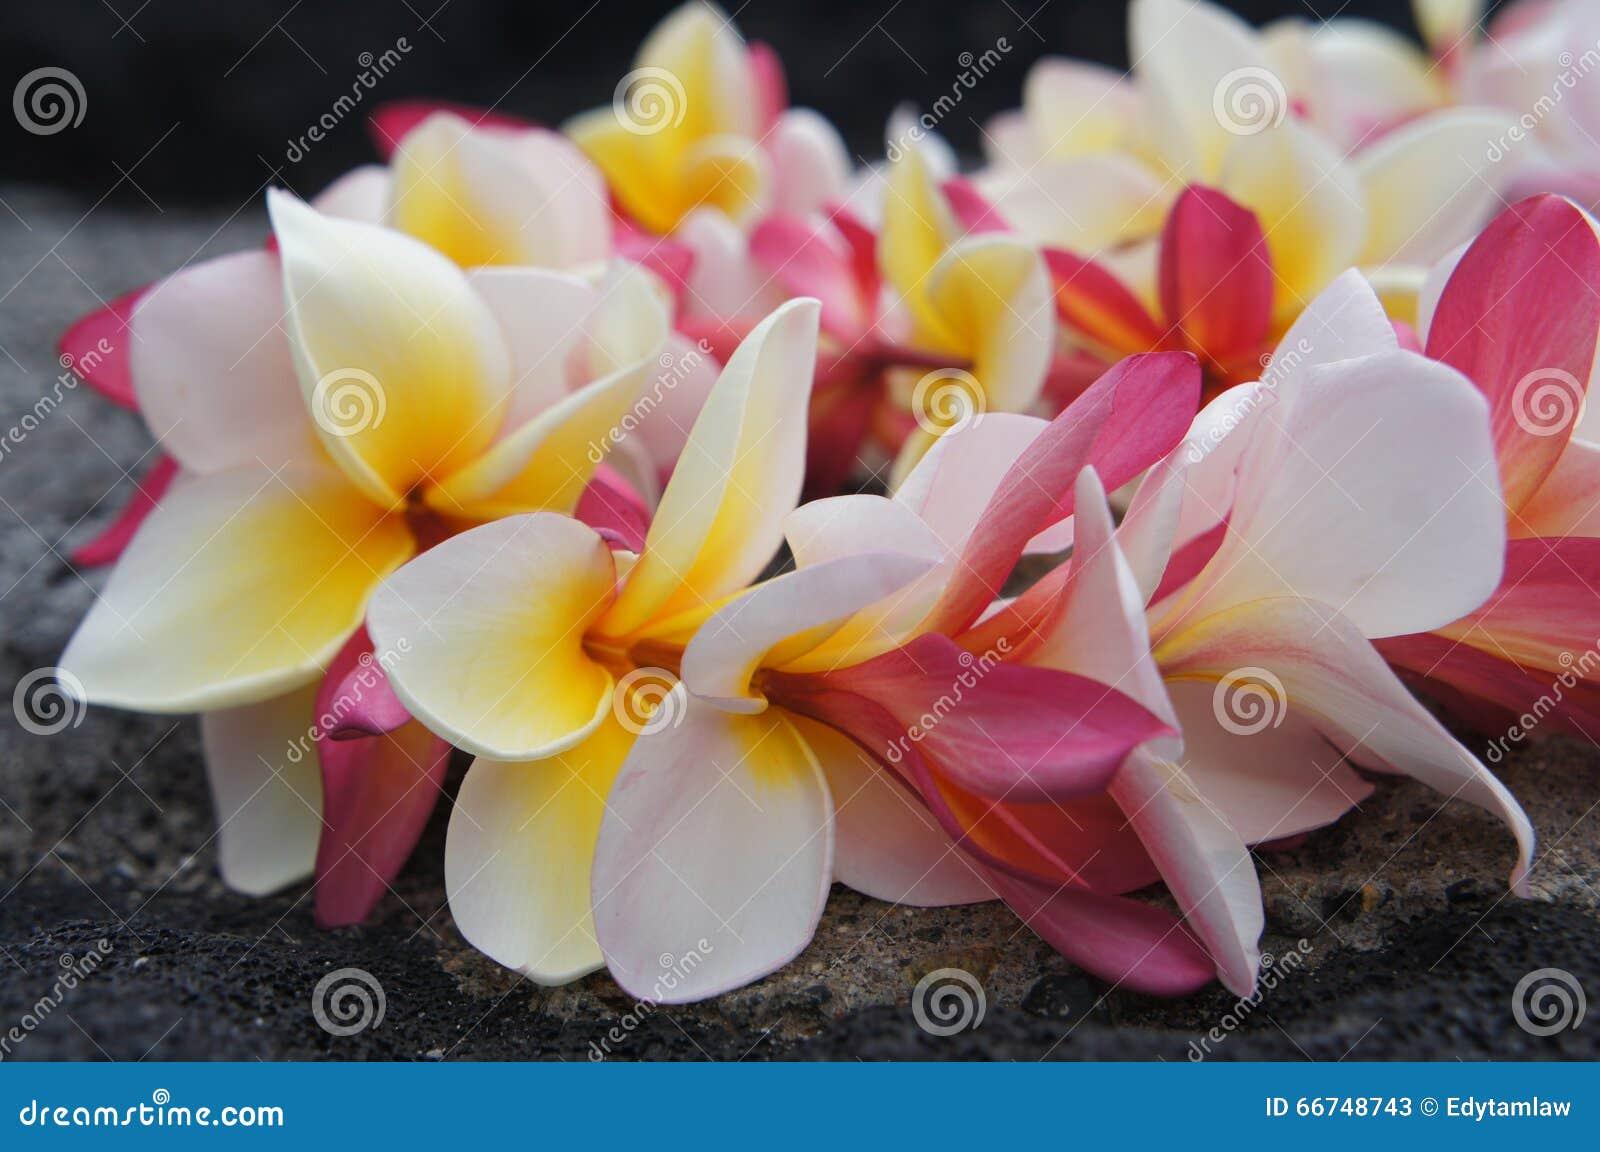 Hawaiian colorful plumeria lei stock image image of yellow white hawaiian colorful plumeria lei izmirmasajfo